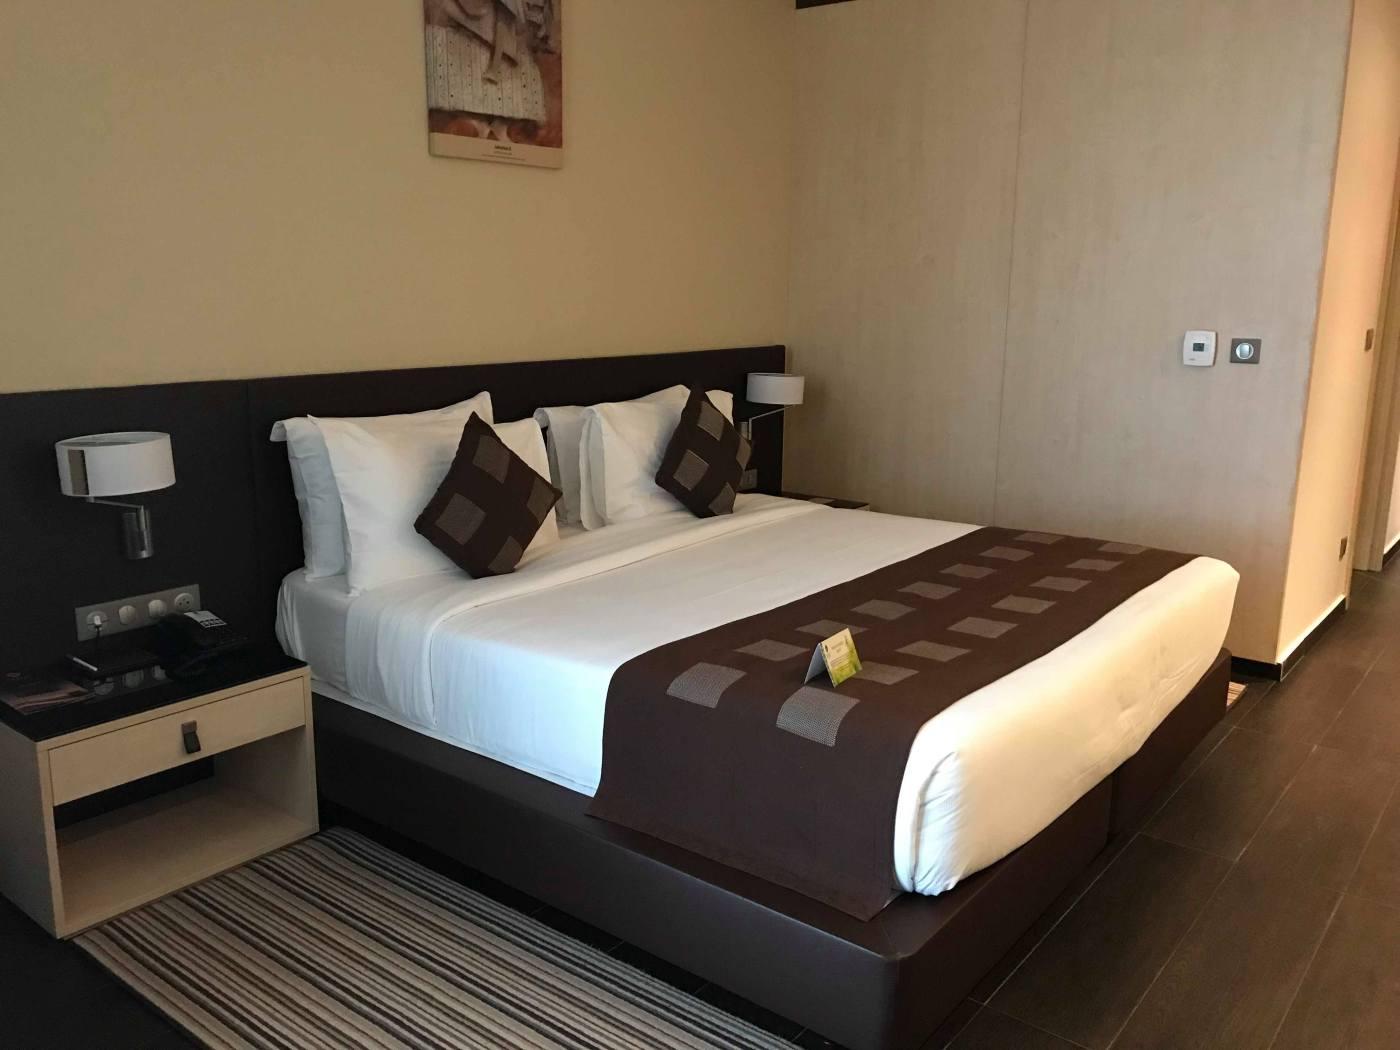 Une nuit à Azalaï hôtel Abidjan, Azalai hôtel Abidjan, serialfoodie, review hôtel, cote d'ivoire, Abidjan, tourisme, travel, trip, tripadvisor